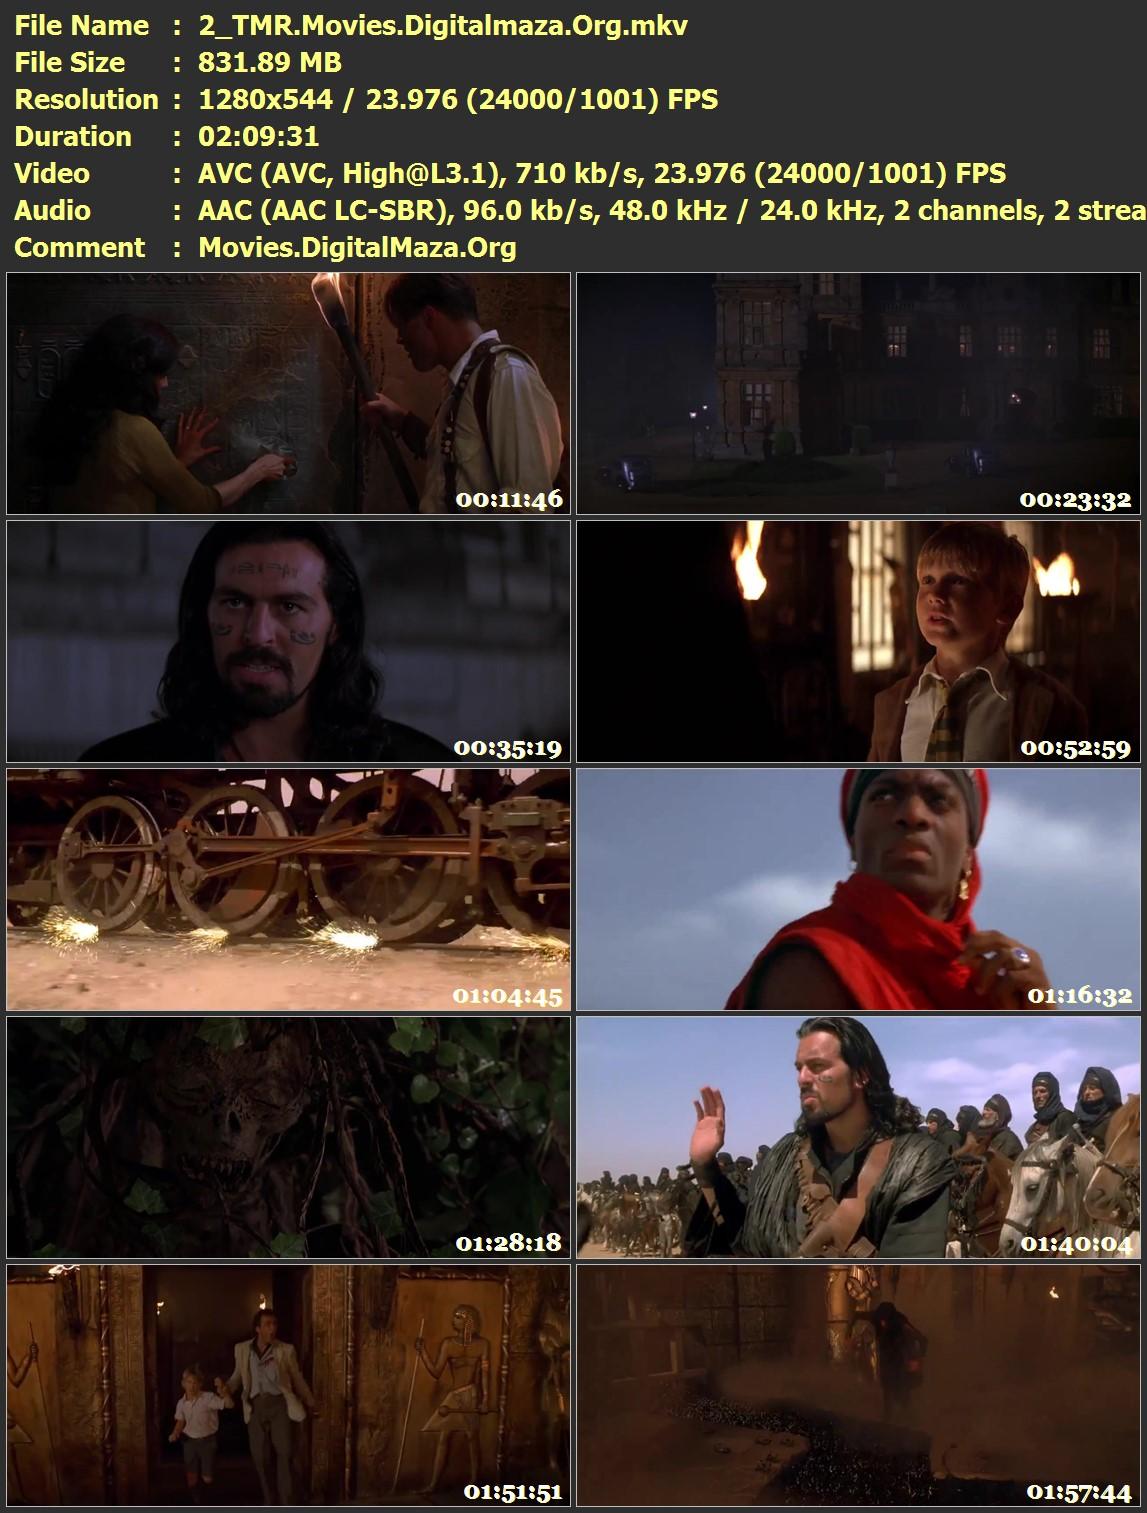 https://image.ibb.co/dTpVtH/2_TMR_Movies_Digitalmaza_Org_mkv.jpg